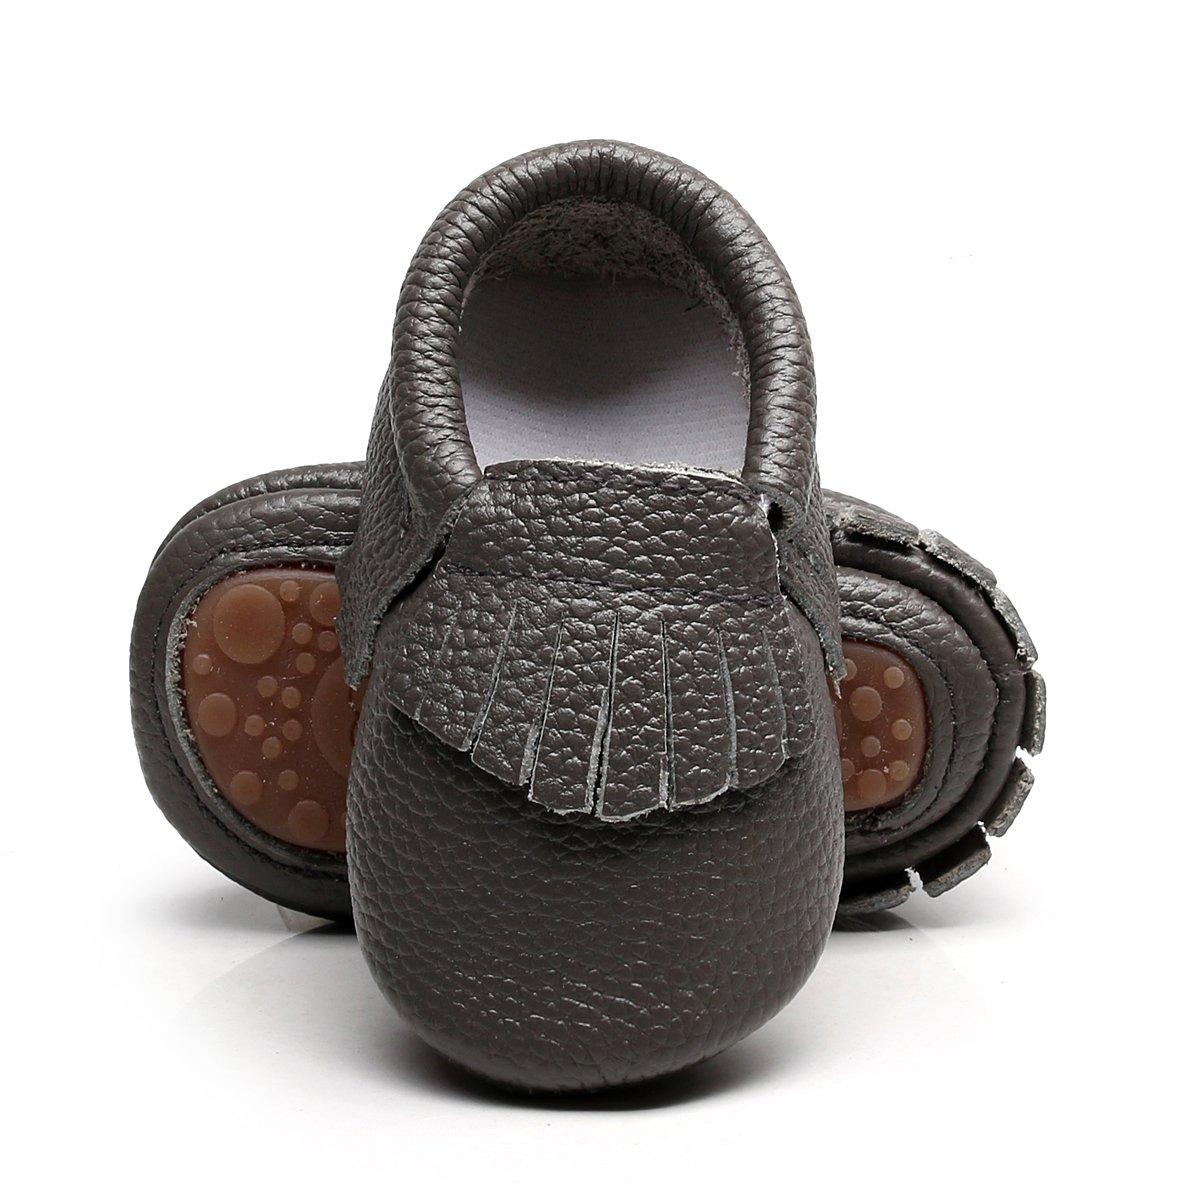 HONGTEYA Leather Baby Moccasins Hard Soled Tassel